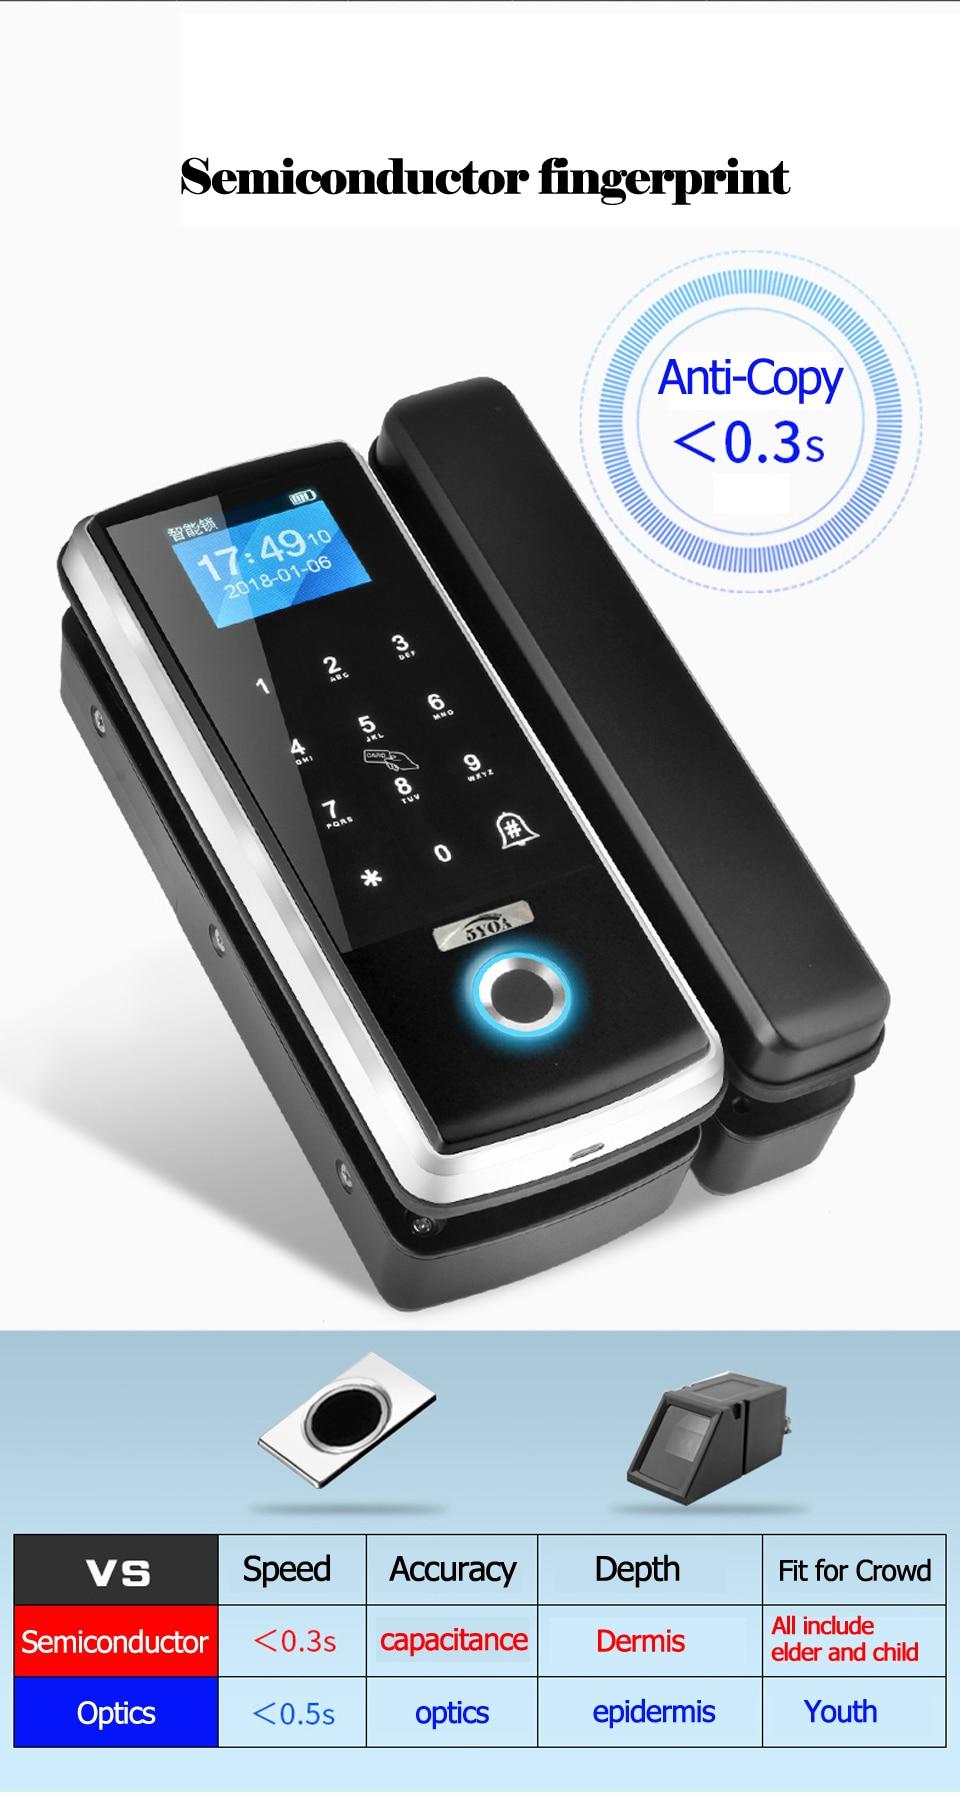 HTB1wtKcd81D3KVjSZFyq6zuFpXaW Smart Door Fingerprint Lock Electronic Digital Gate Opener Electric RFID Biometric finger print security Glass Password Card